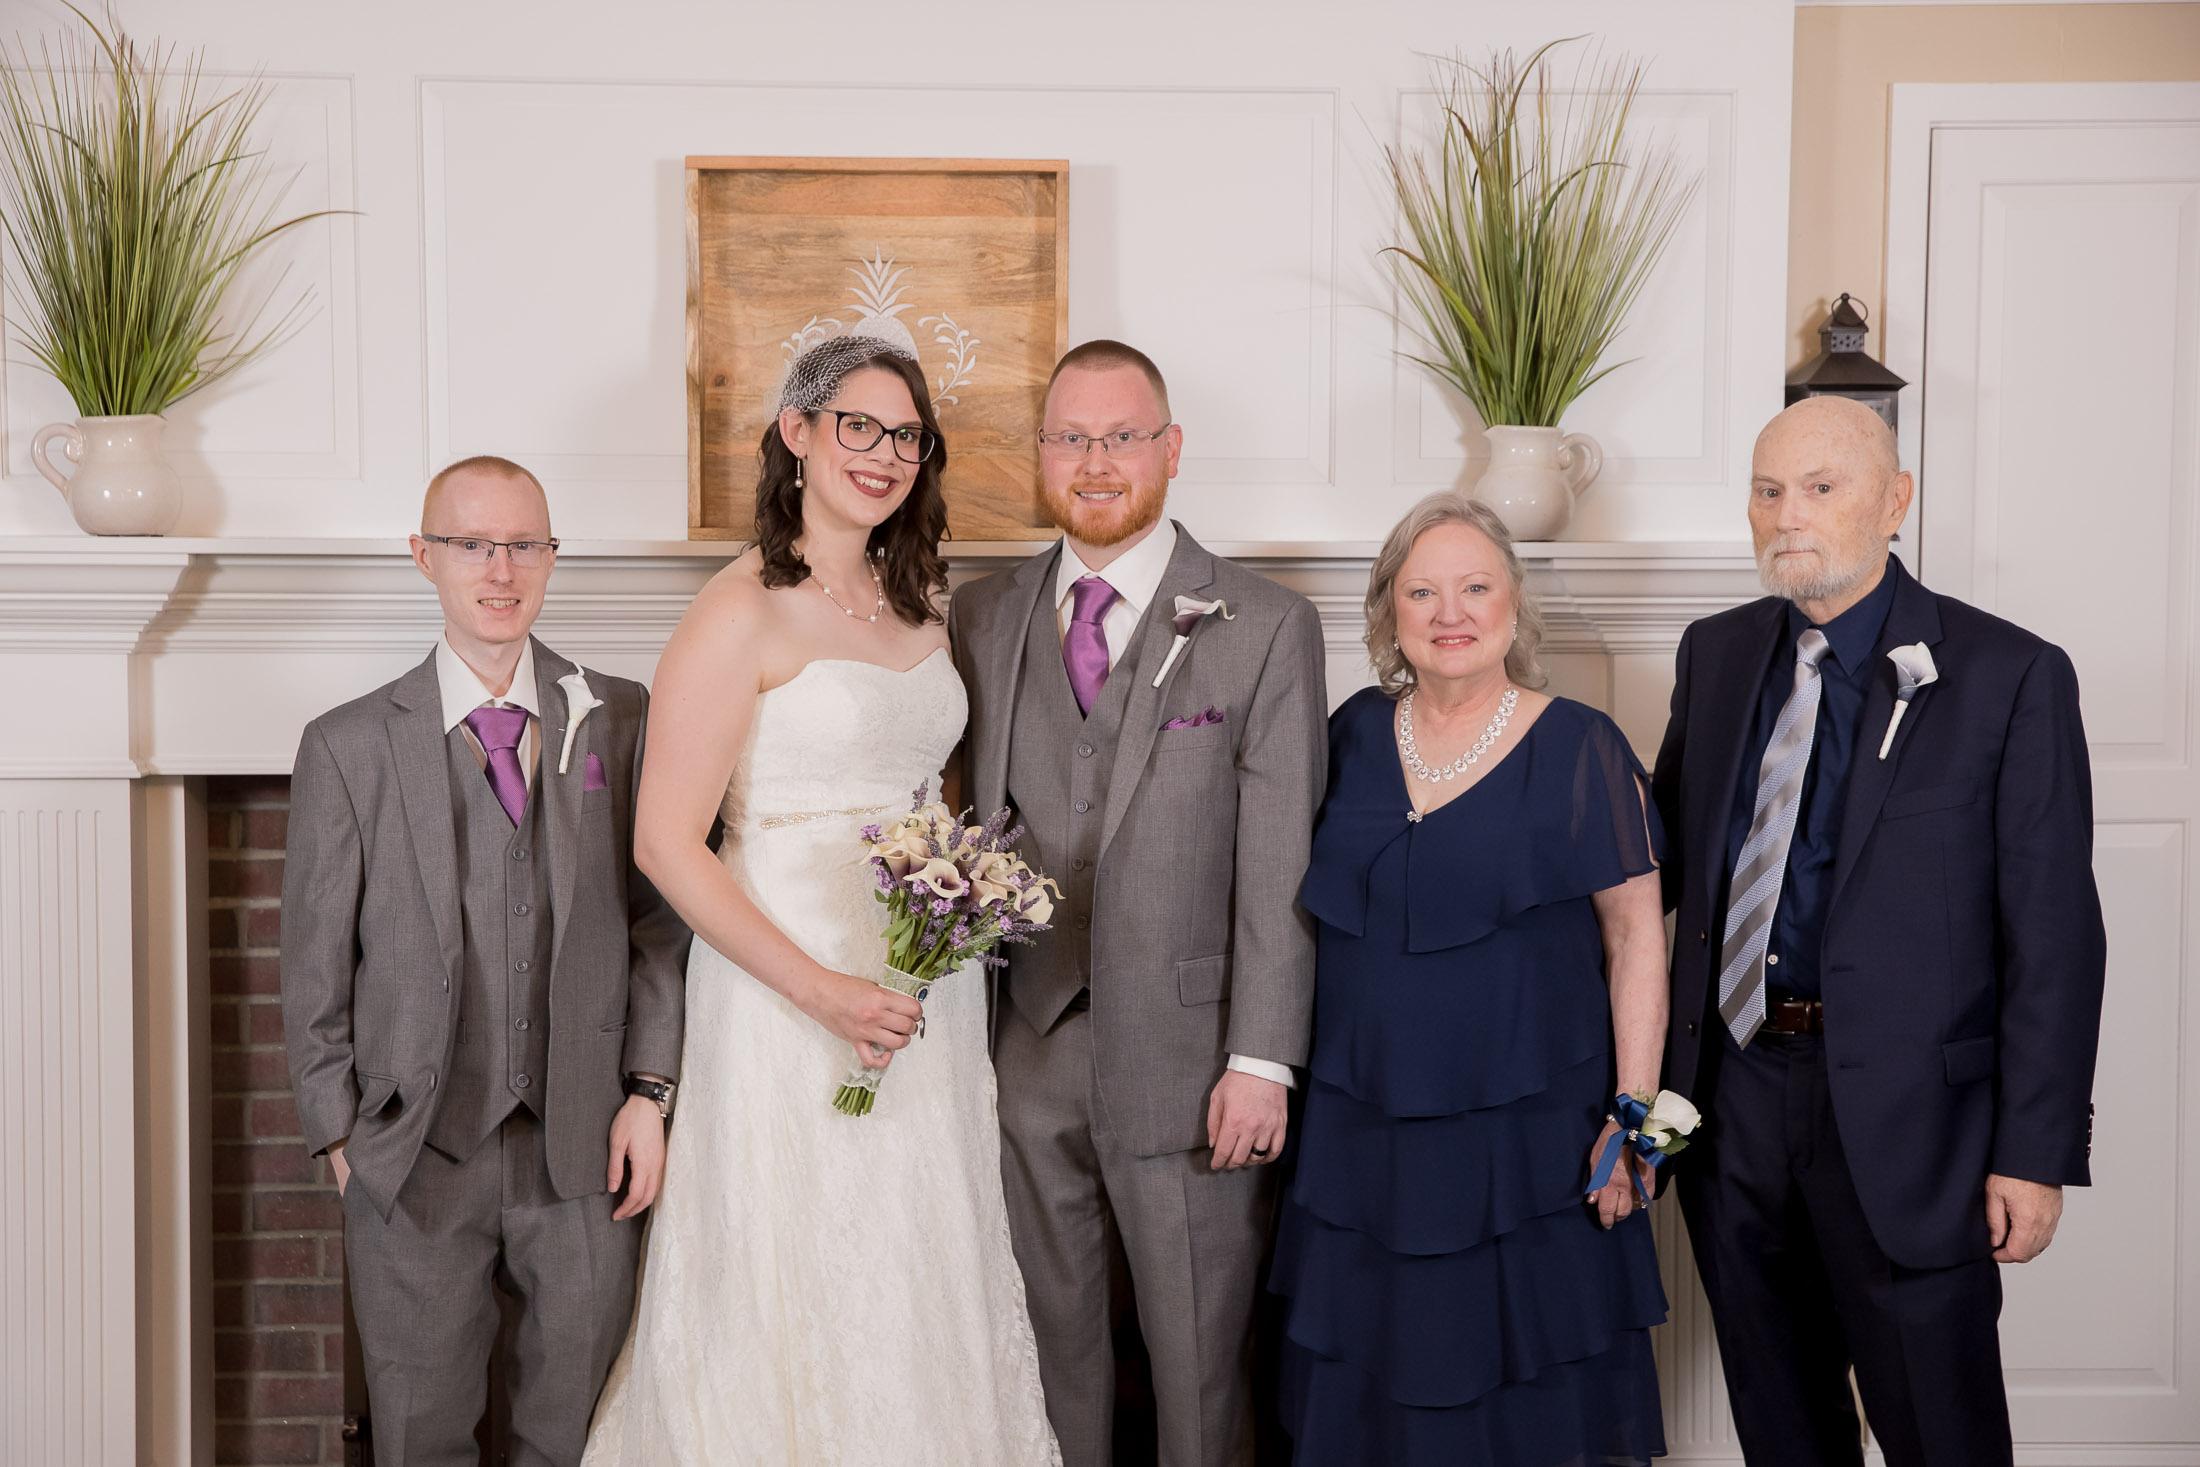 family formal, wedding, tracy jenkins photography, publick house, Massachusetts, new england,  photography